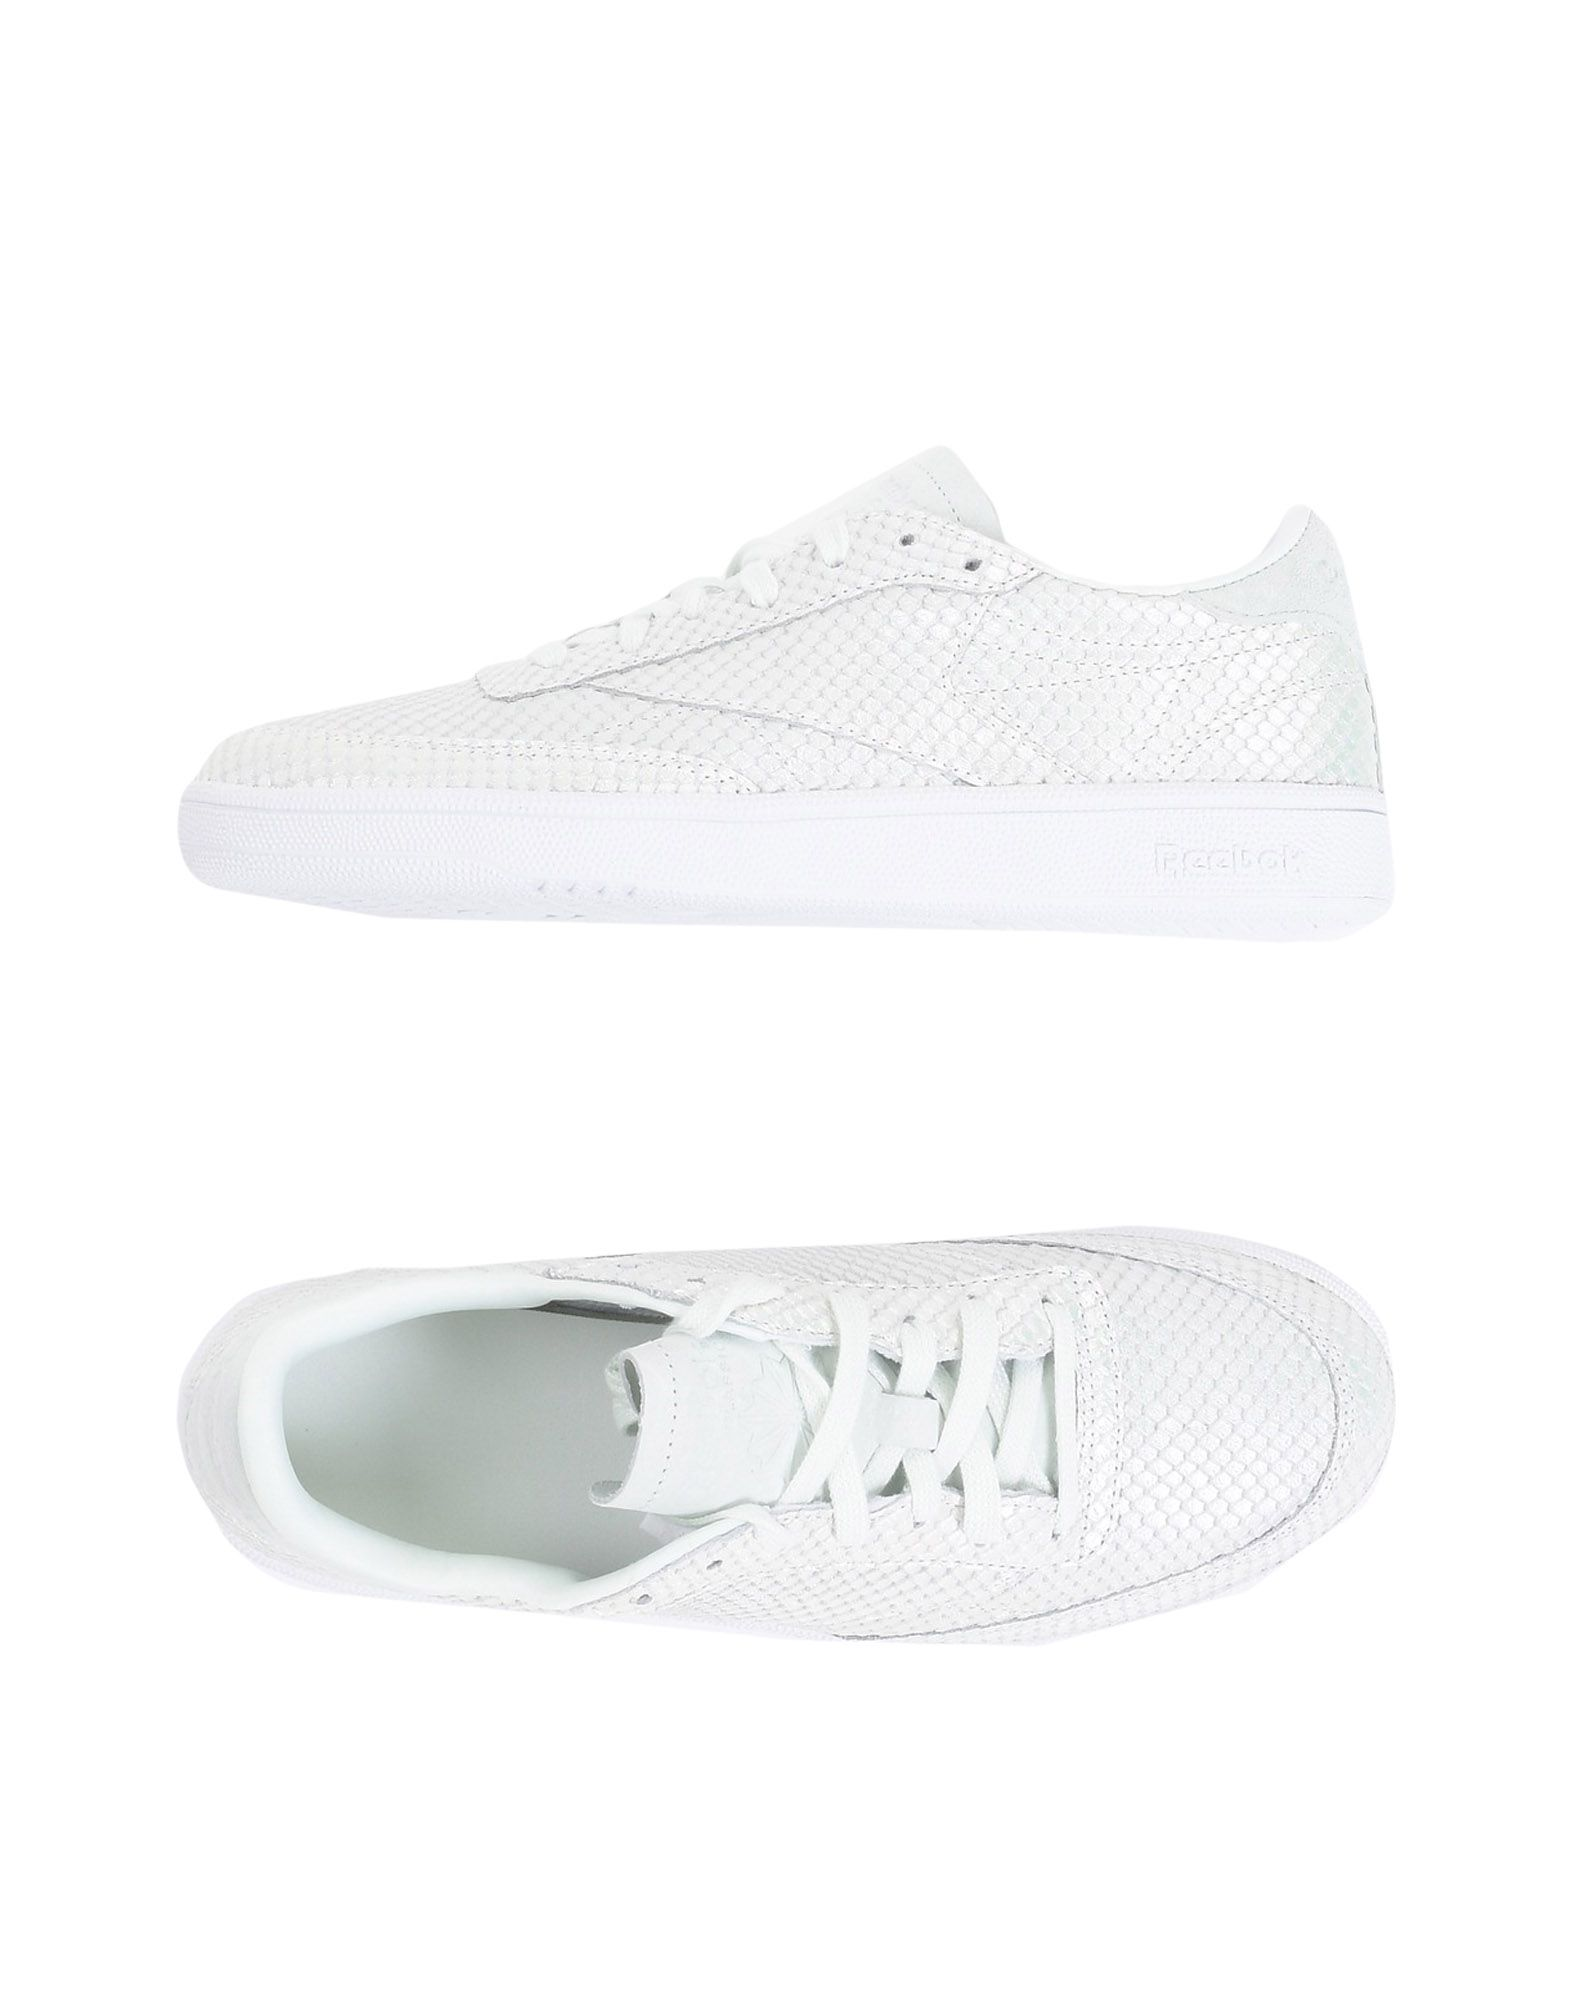 Sneakers Reebok Club C 85 11443468DK Textural - Donna - 11443468DK 85 748f02